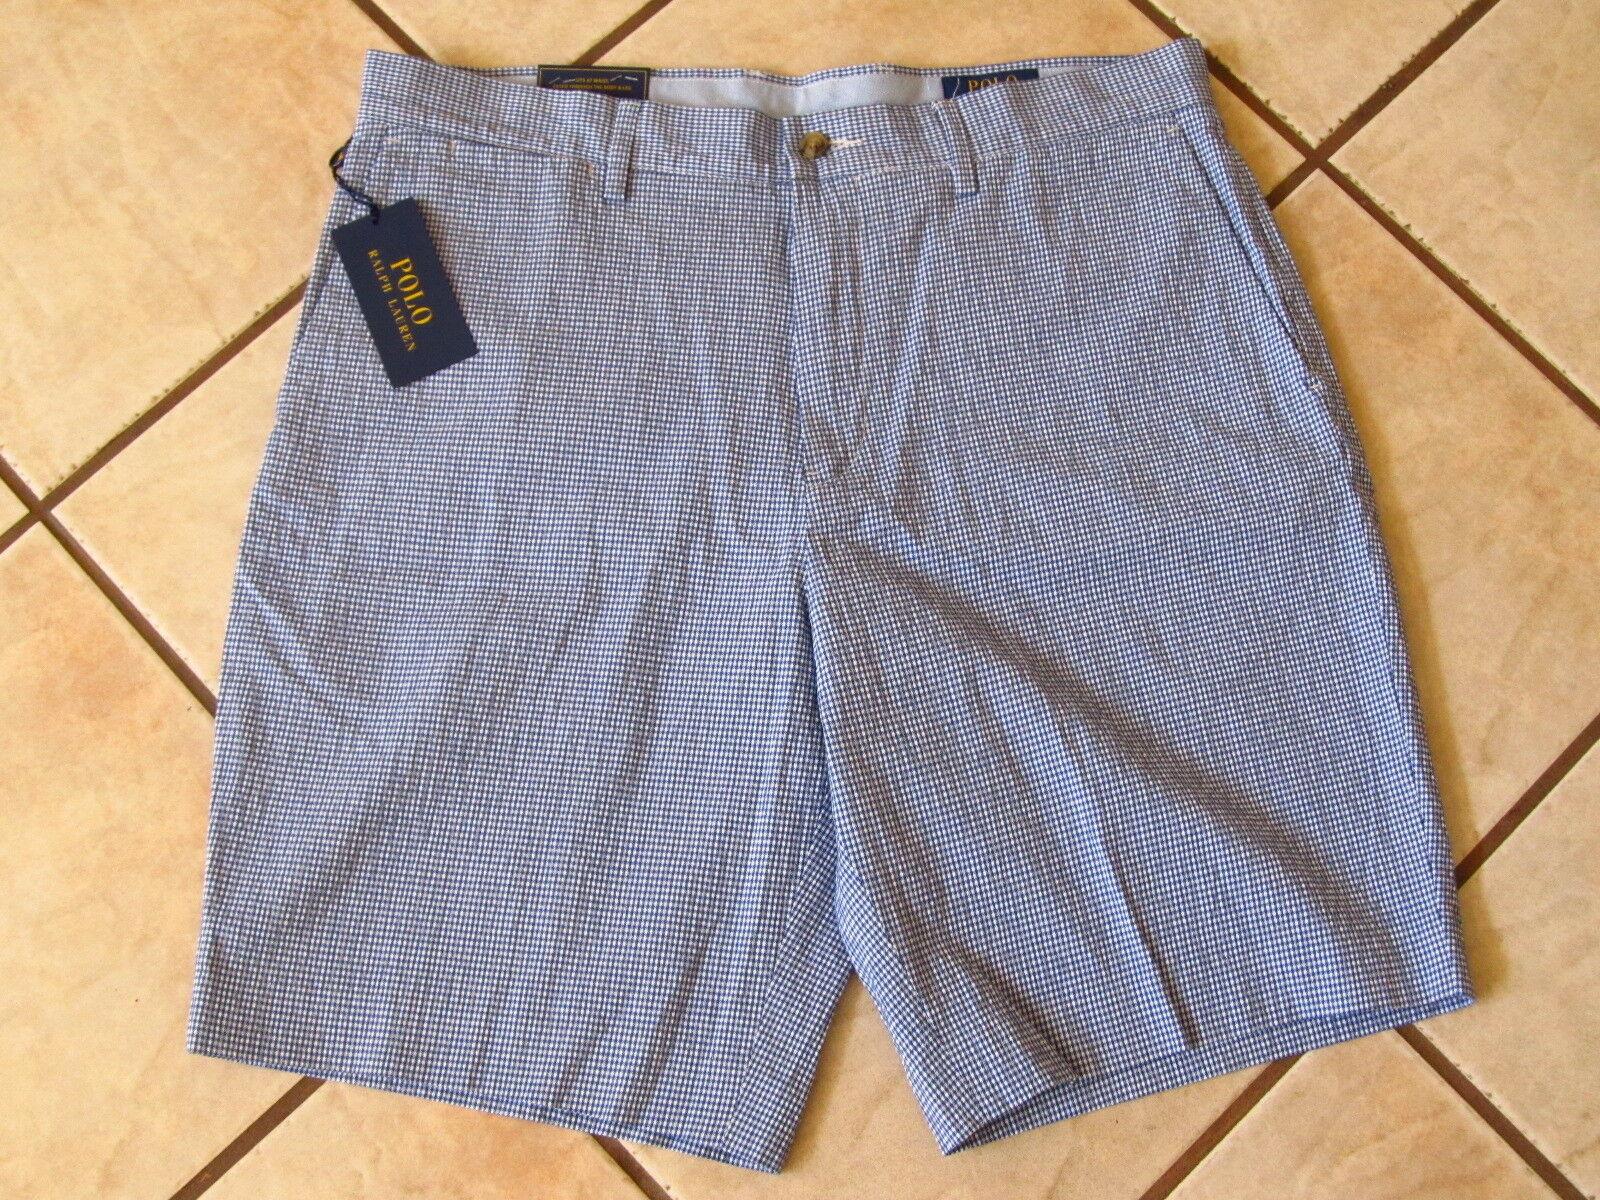 Polo Ralph Lauren Men's bluee White Shorts Stretch Classic Fit Sz 34W NWT